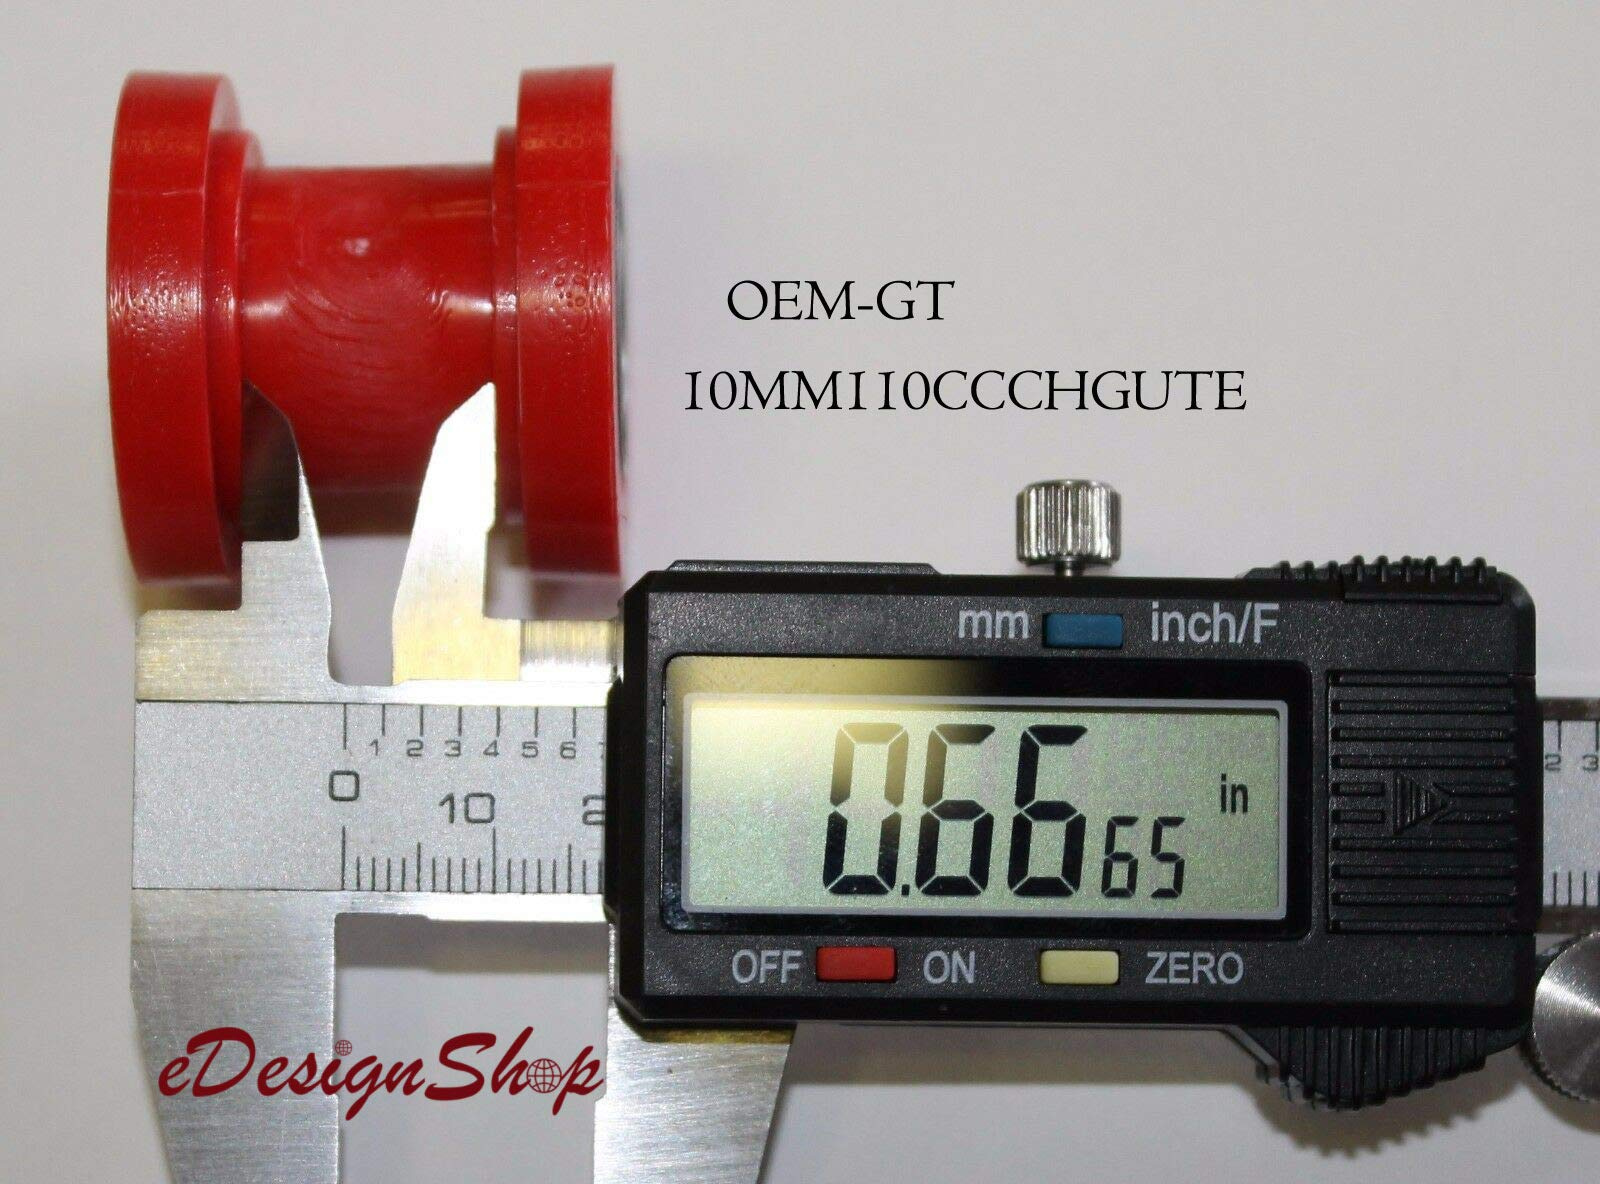 10MM CHAIN ROLLER GUIDE TENSIONER 110cc 125cc 150 250 DIRT MINI BIKE BUGGY ATV